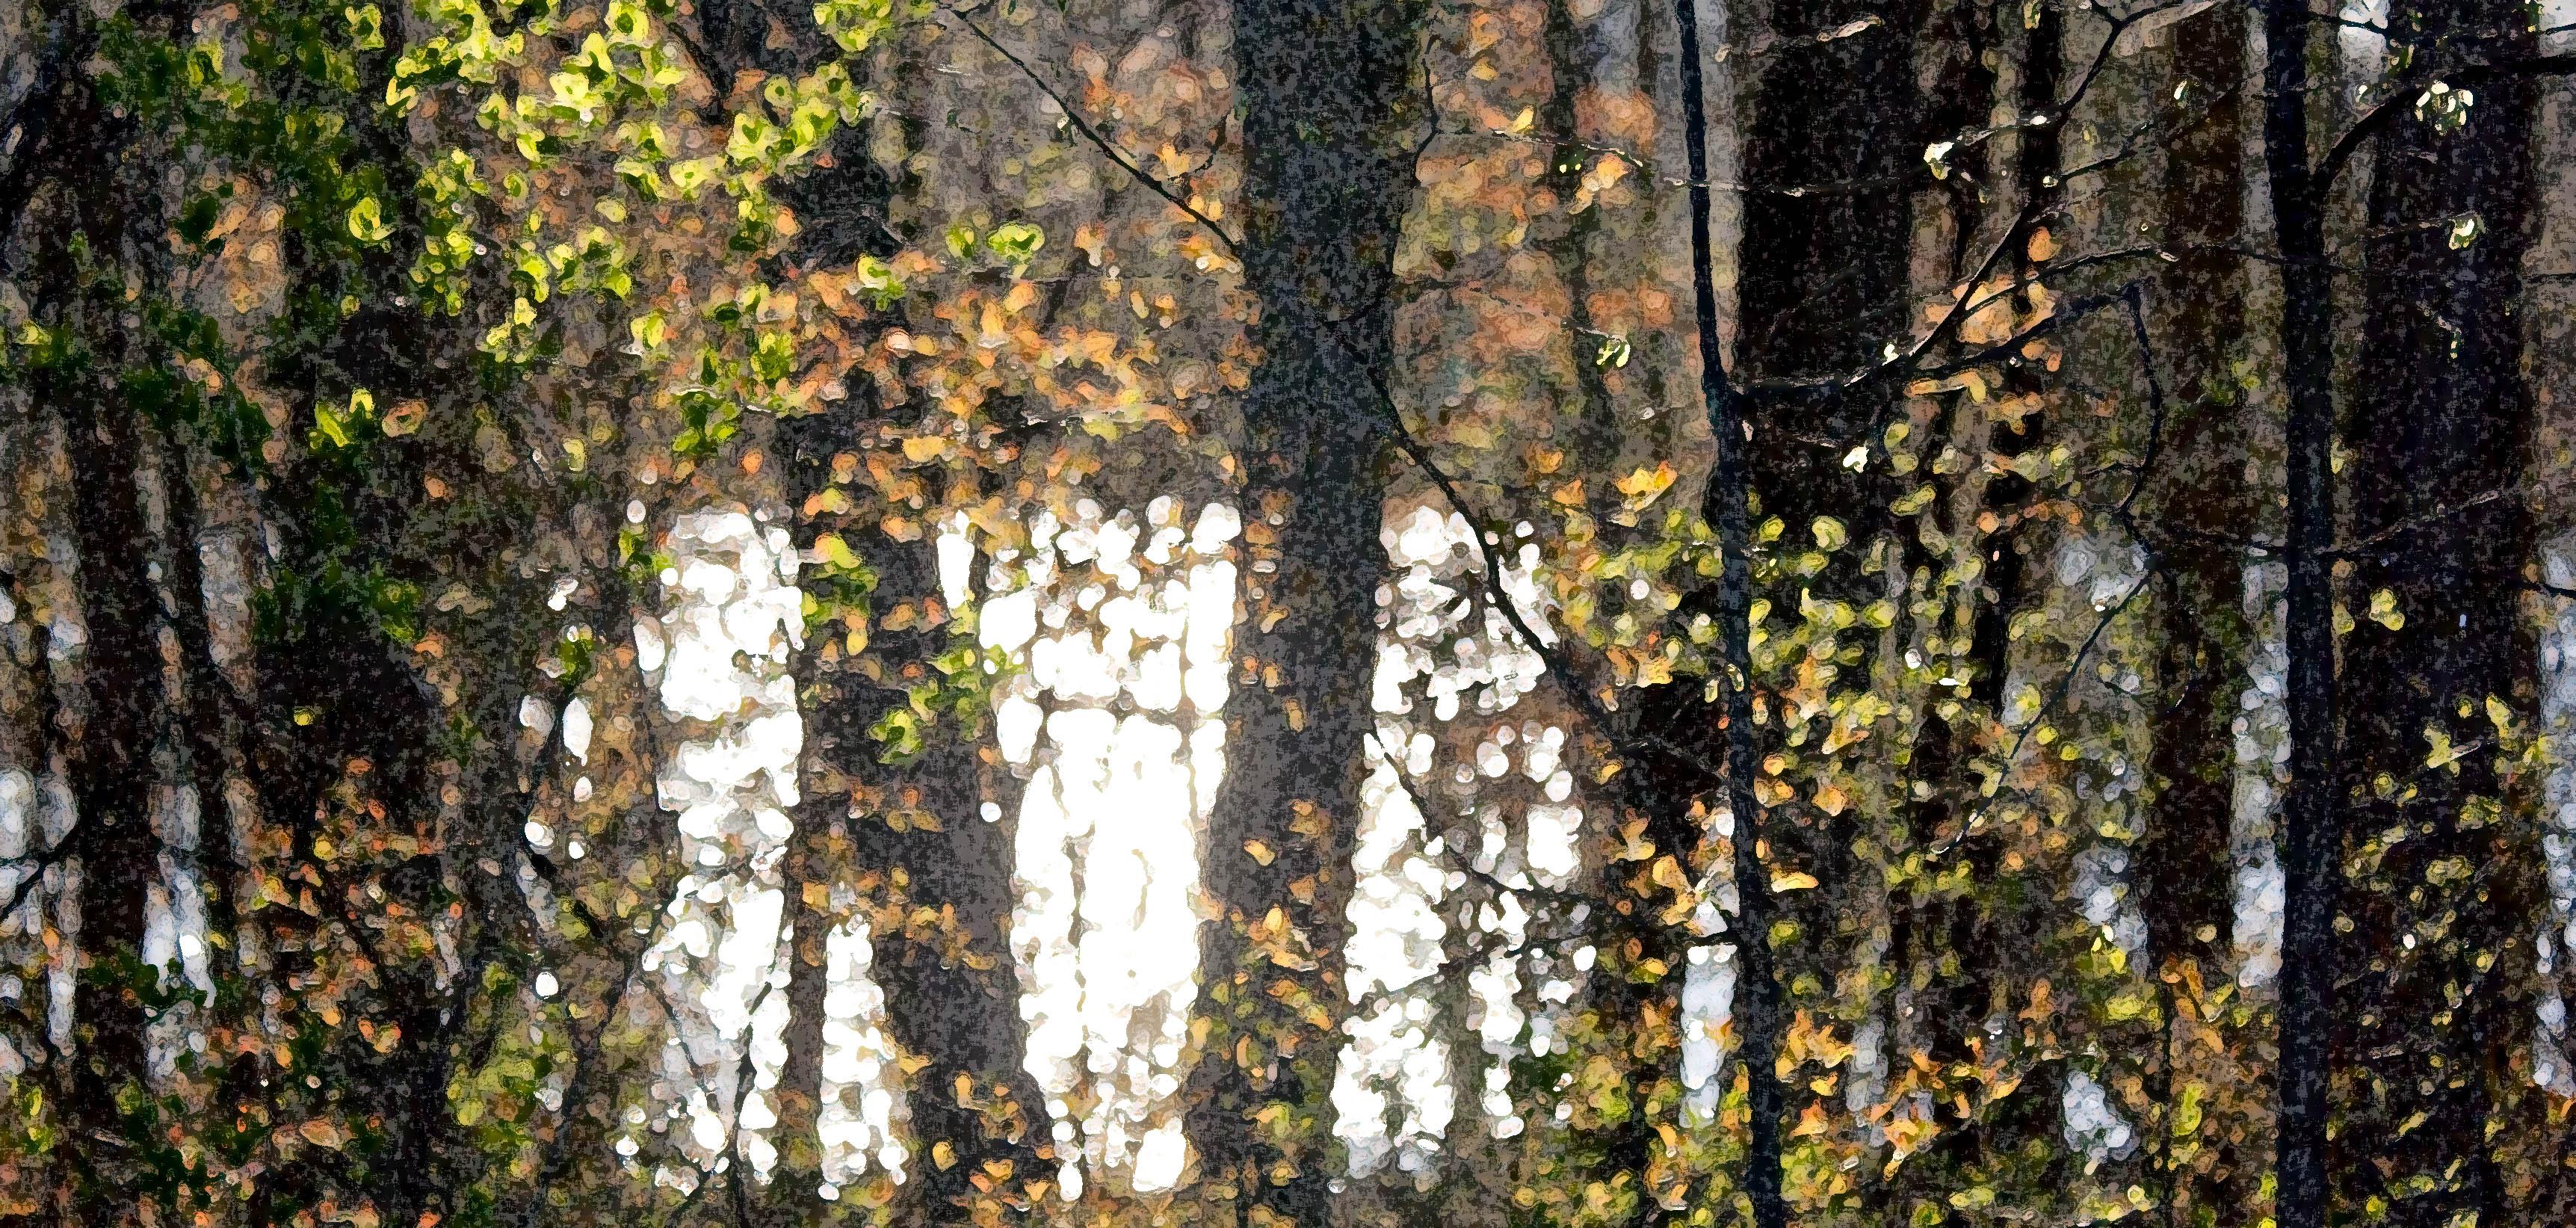 Nina Munteanu Talks Water and Writing on Kentucky's WMST-am Radio